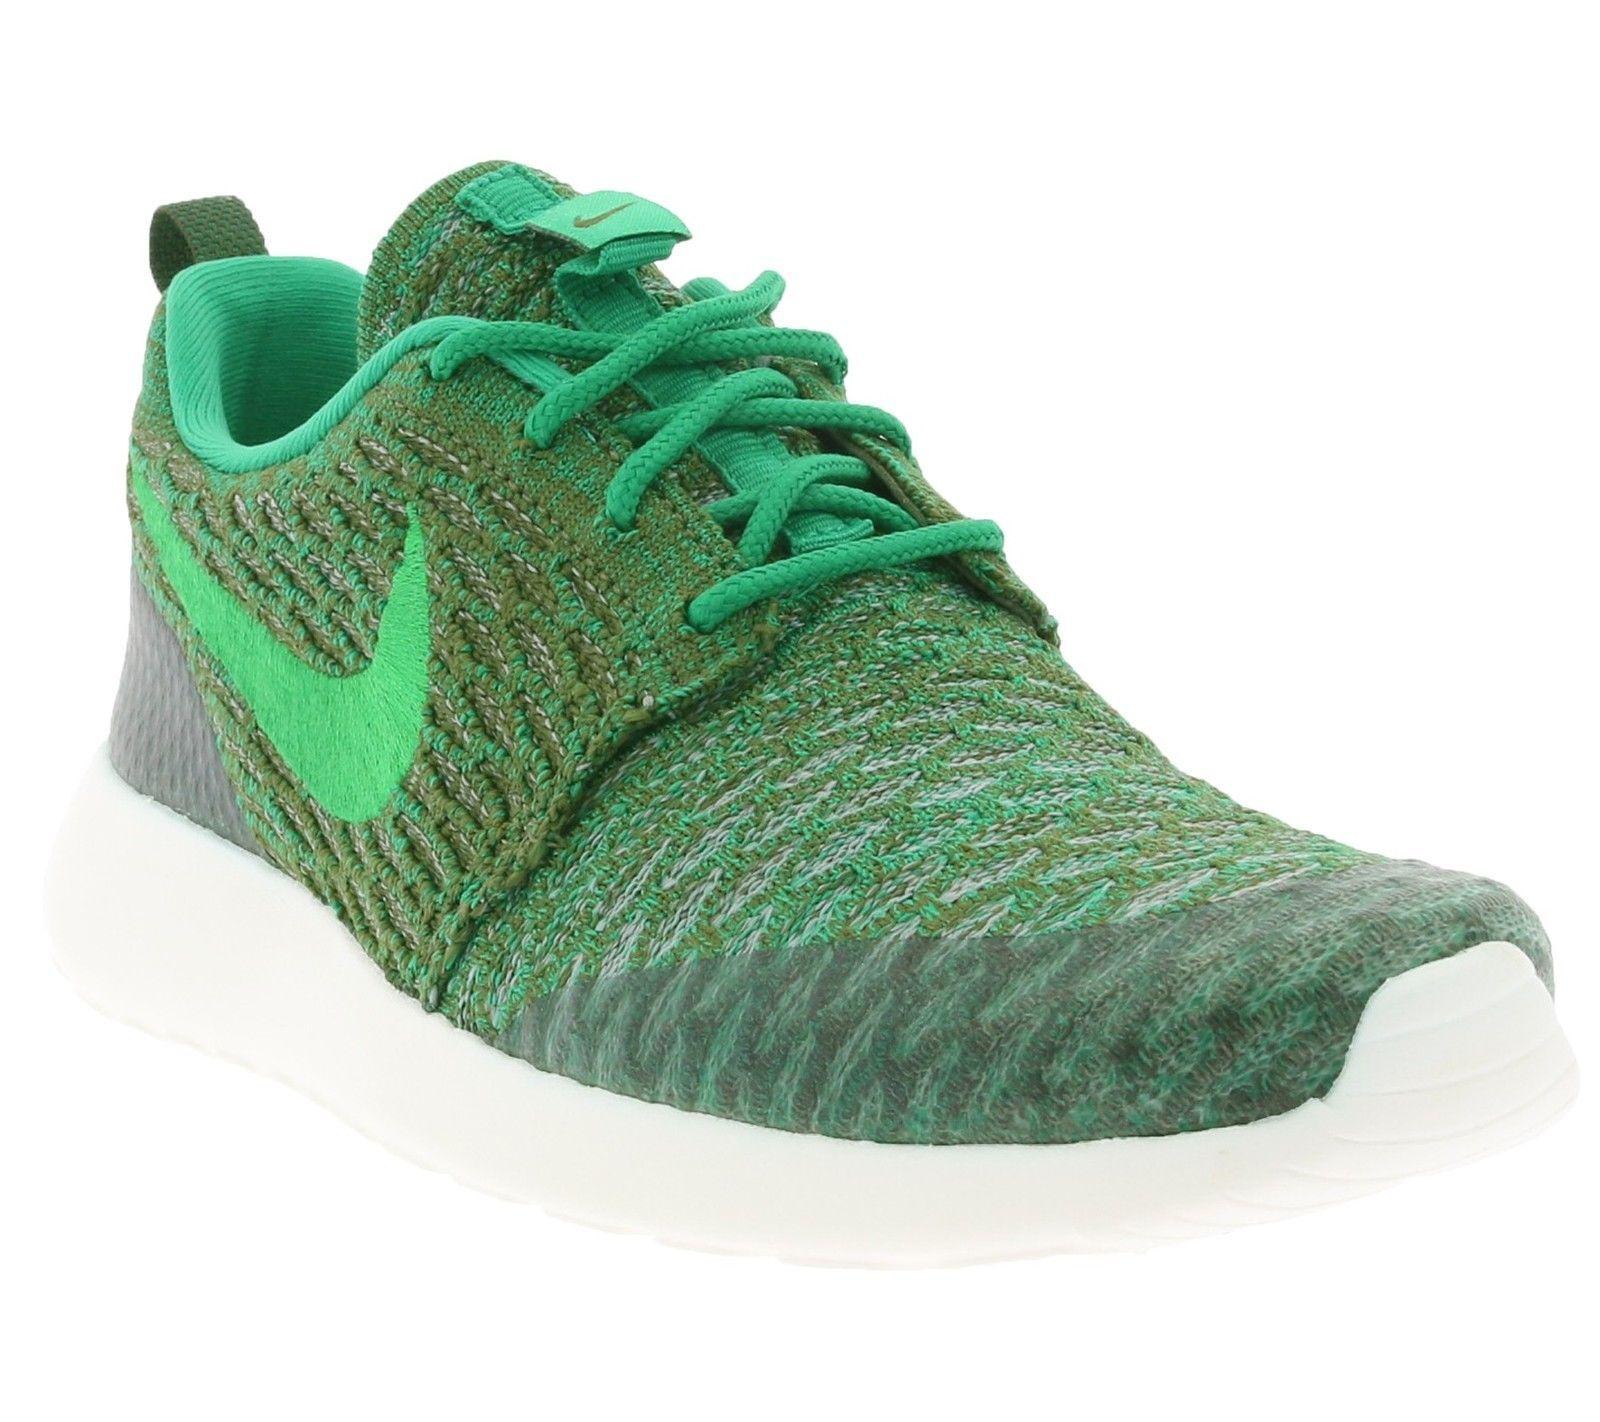 NEW WMNS NIKE Roshe One Flyknit 704927-303 Green Sneaker Running Shoe Sz 7.5 8.5